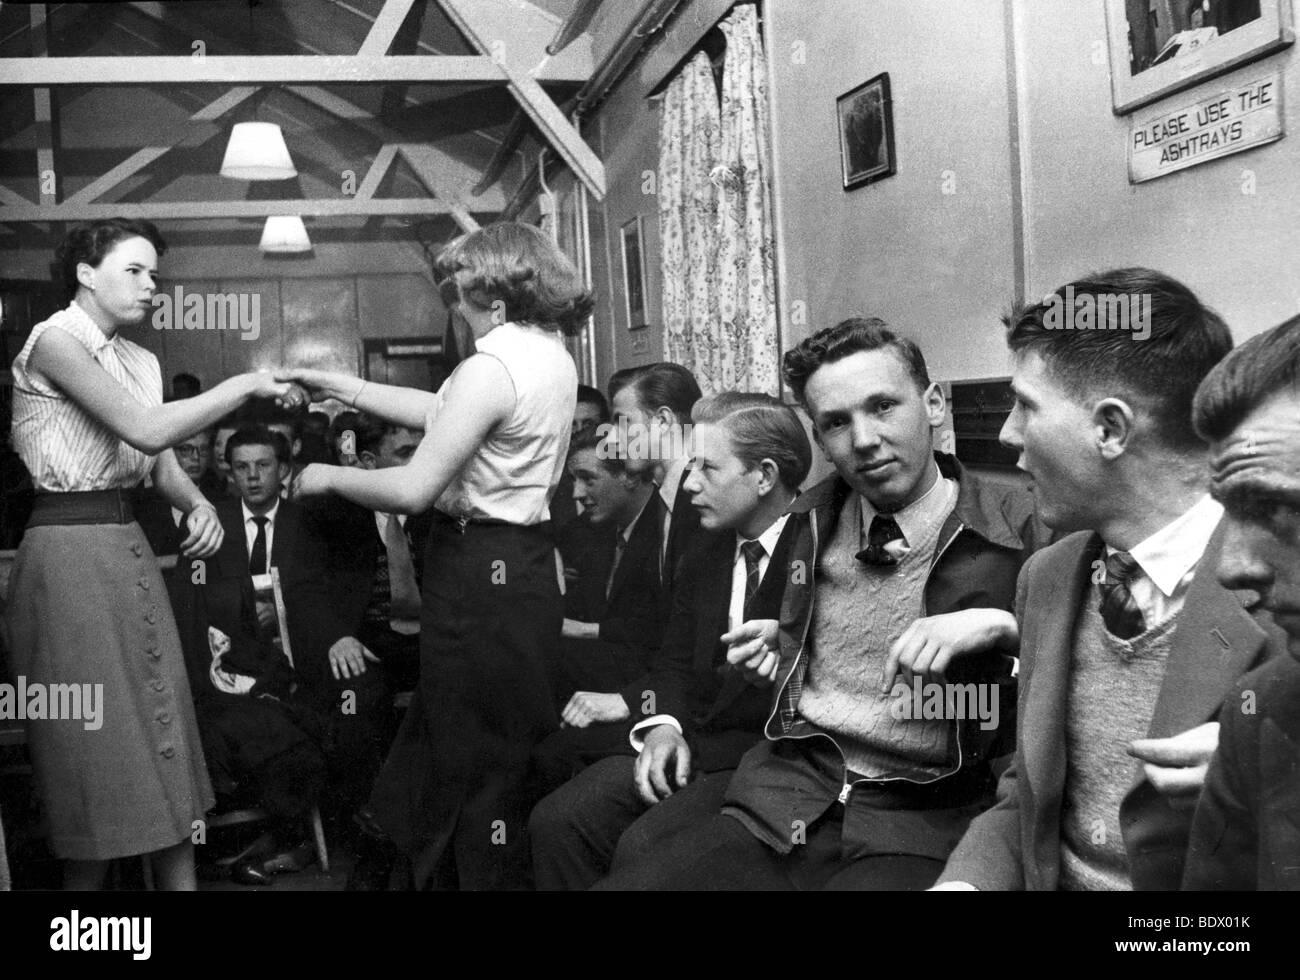 SOUTH LONDON teenage dance club en 1957 Imagen De Stock